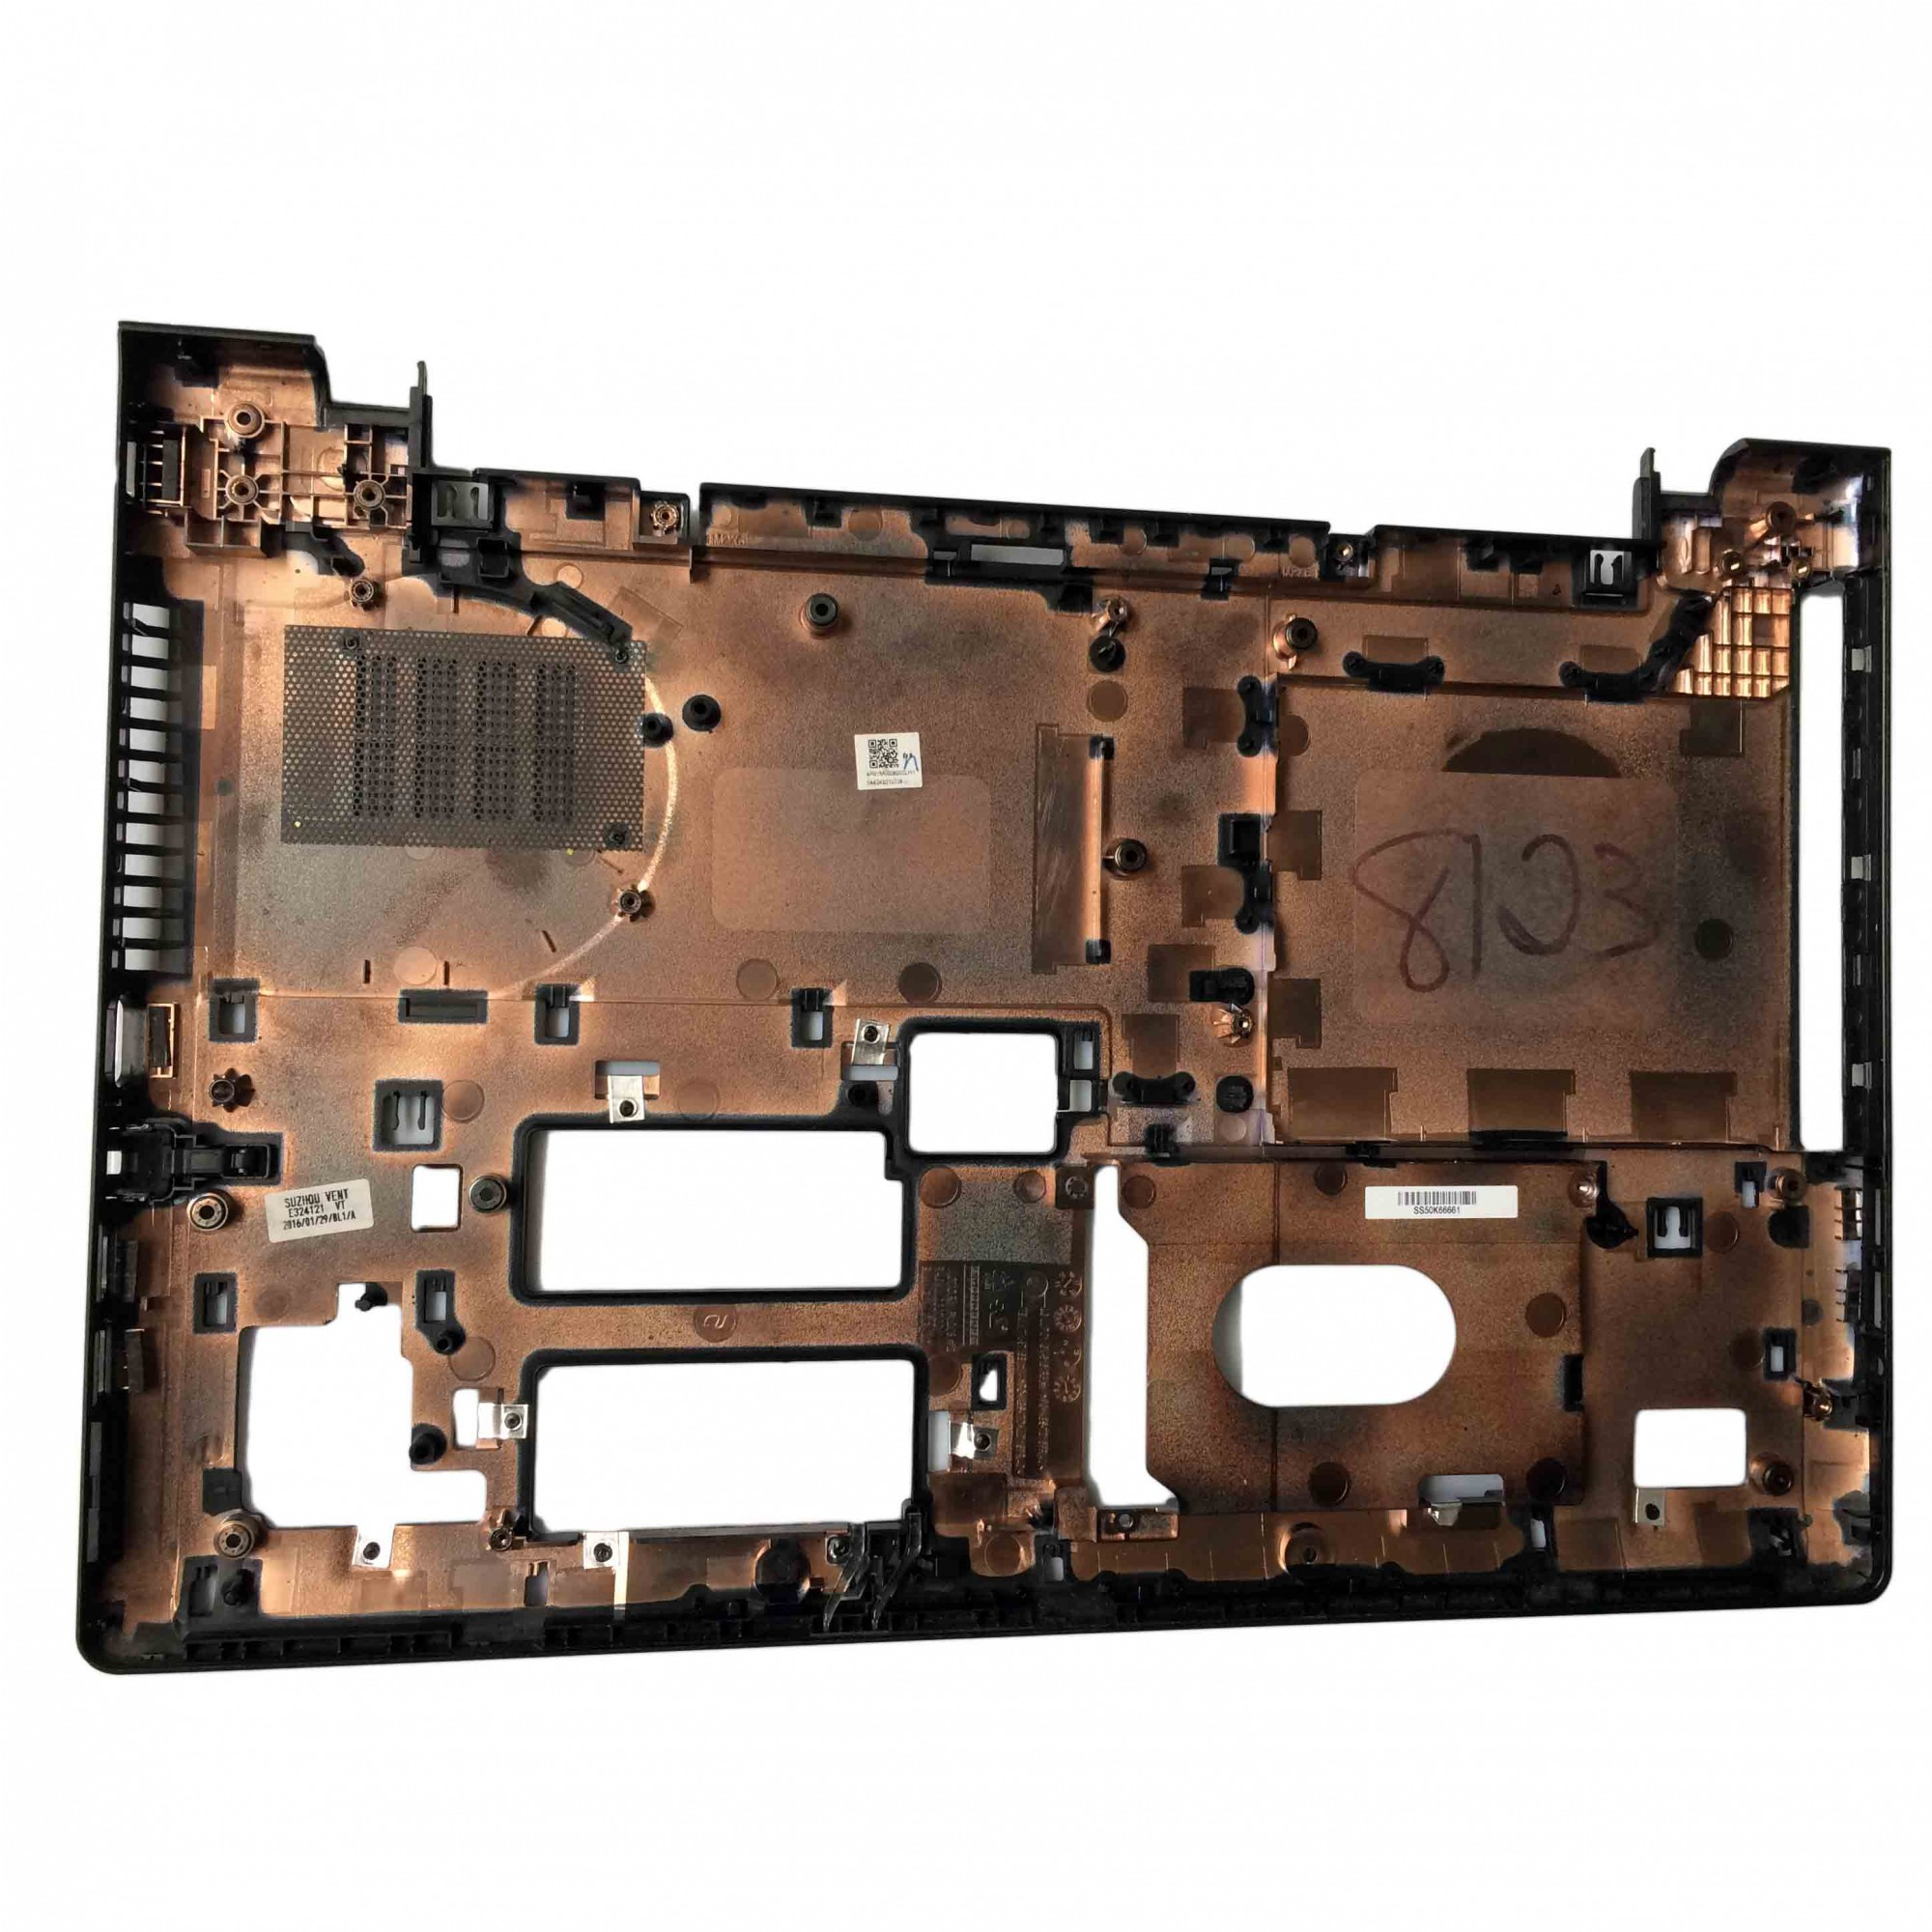 Carcaça Base Inferior + Tampa HD Notebook Lenovo Ideapad 300-15ISK PN:ap0ym000 - Retirado